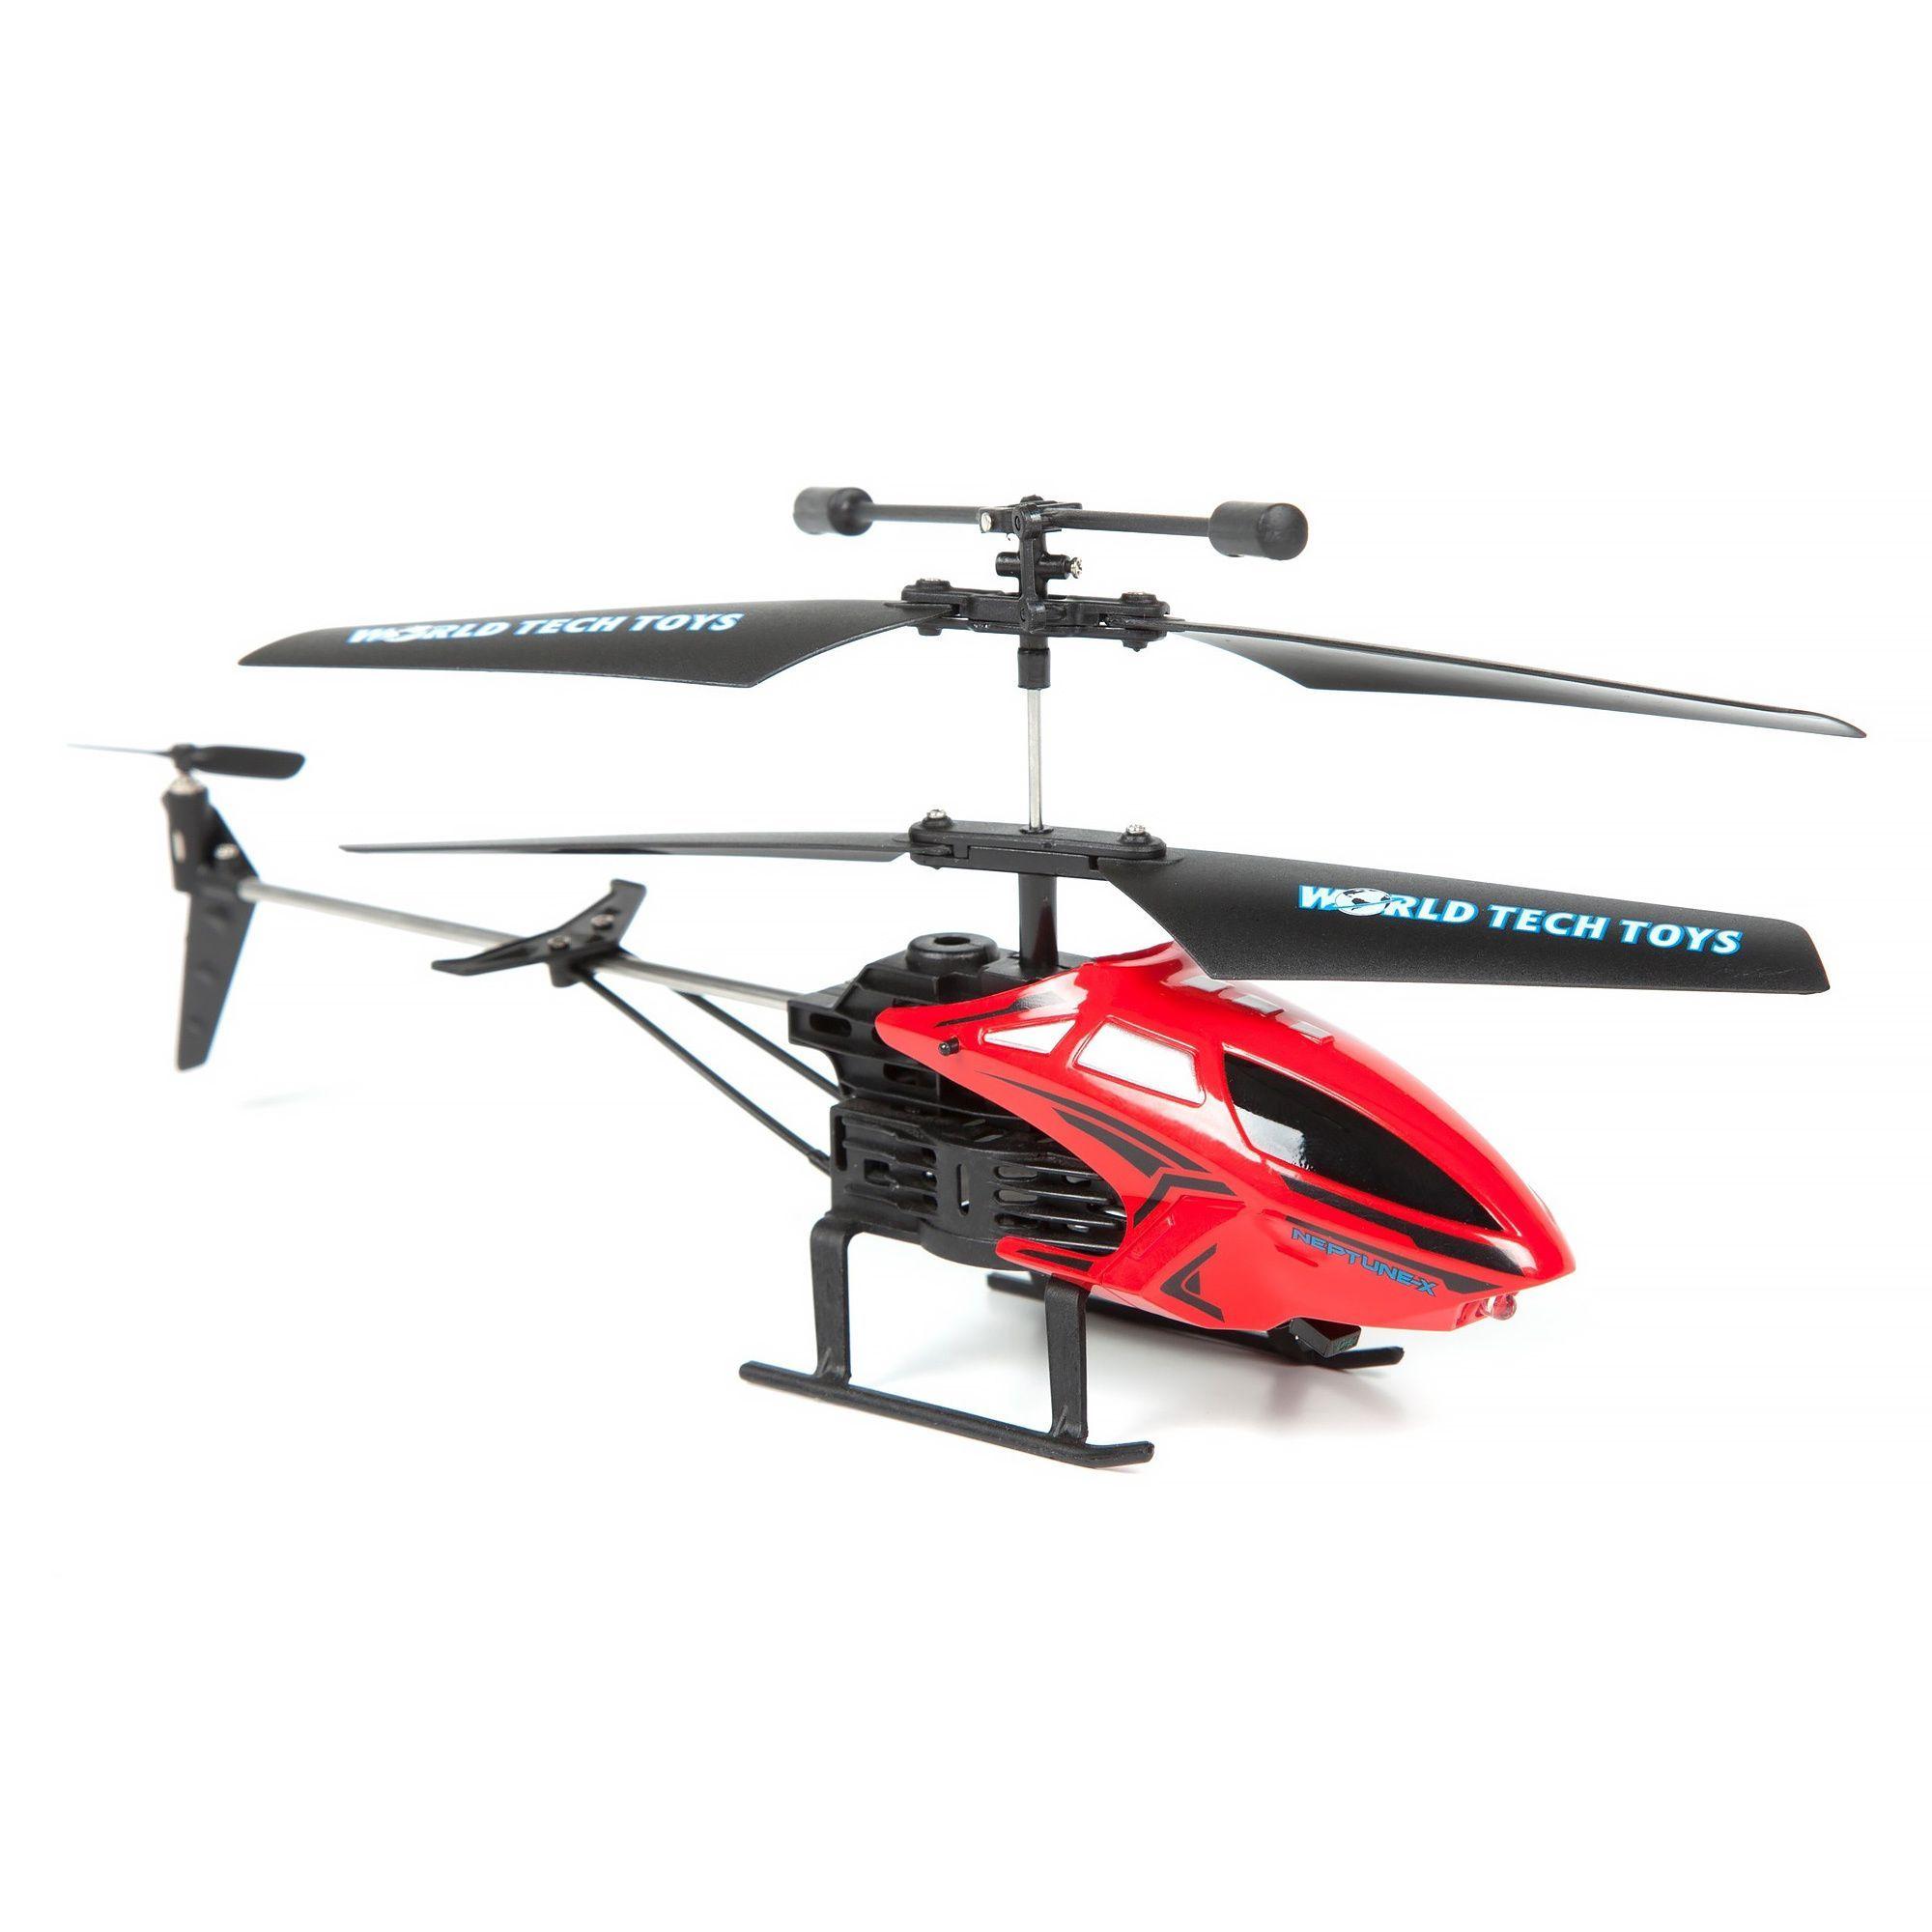 World Tech Neptune X 3 5CH Gyro IR Helicopter